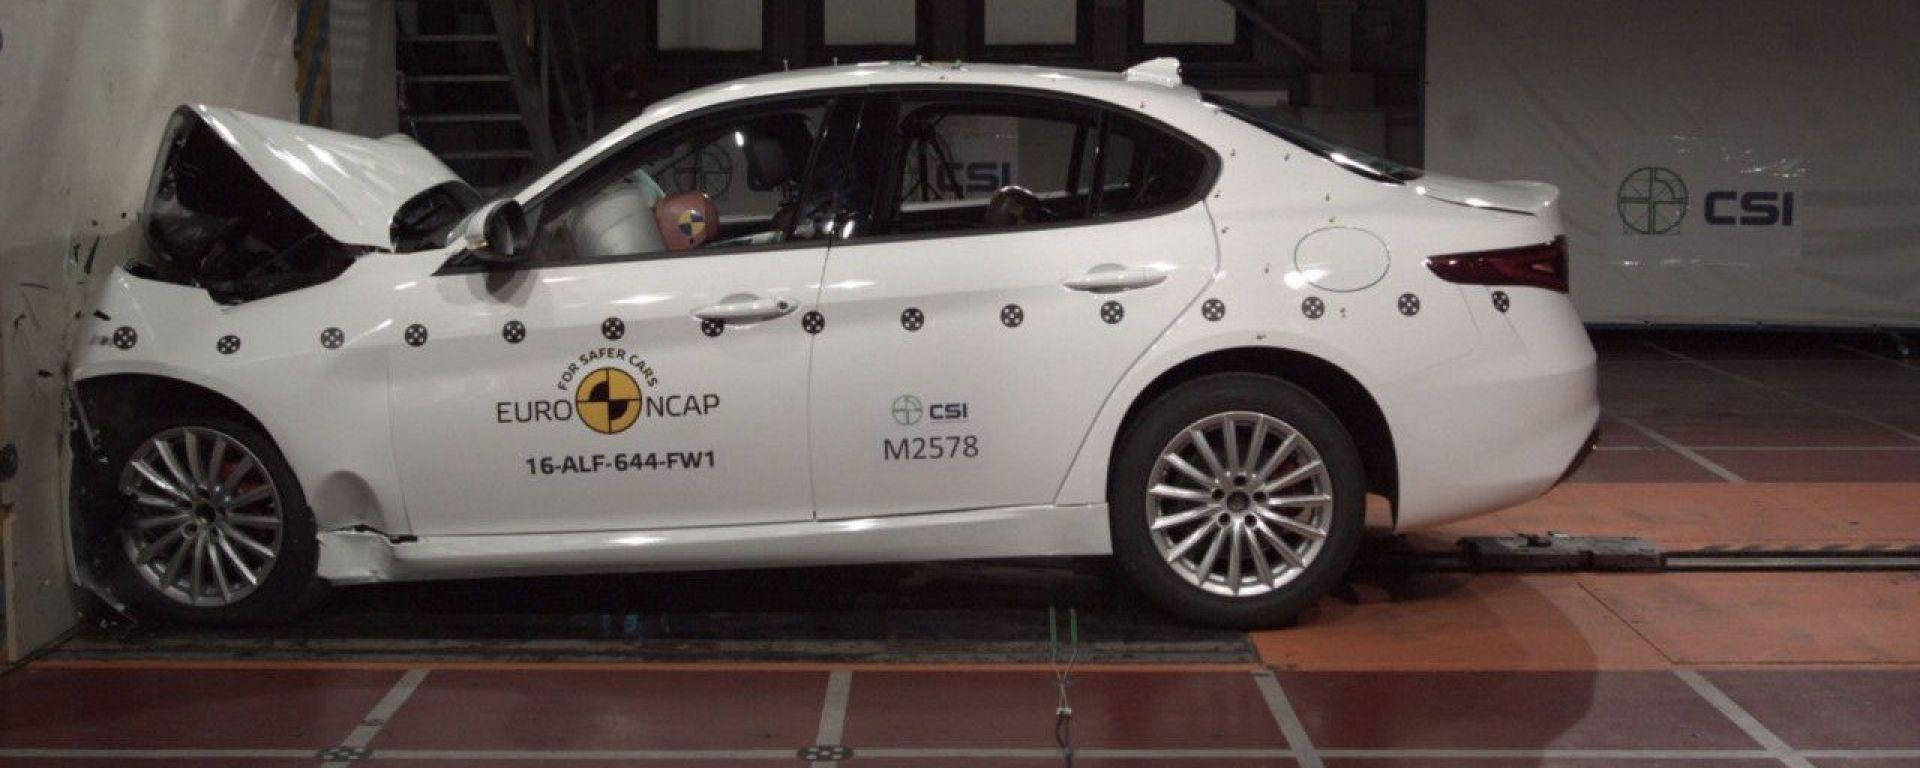 EuroNCAP 2016: i risultati di Alfa Giulia, Seat Ateca e VW Tiguan